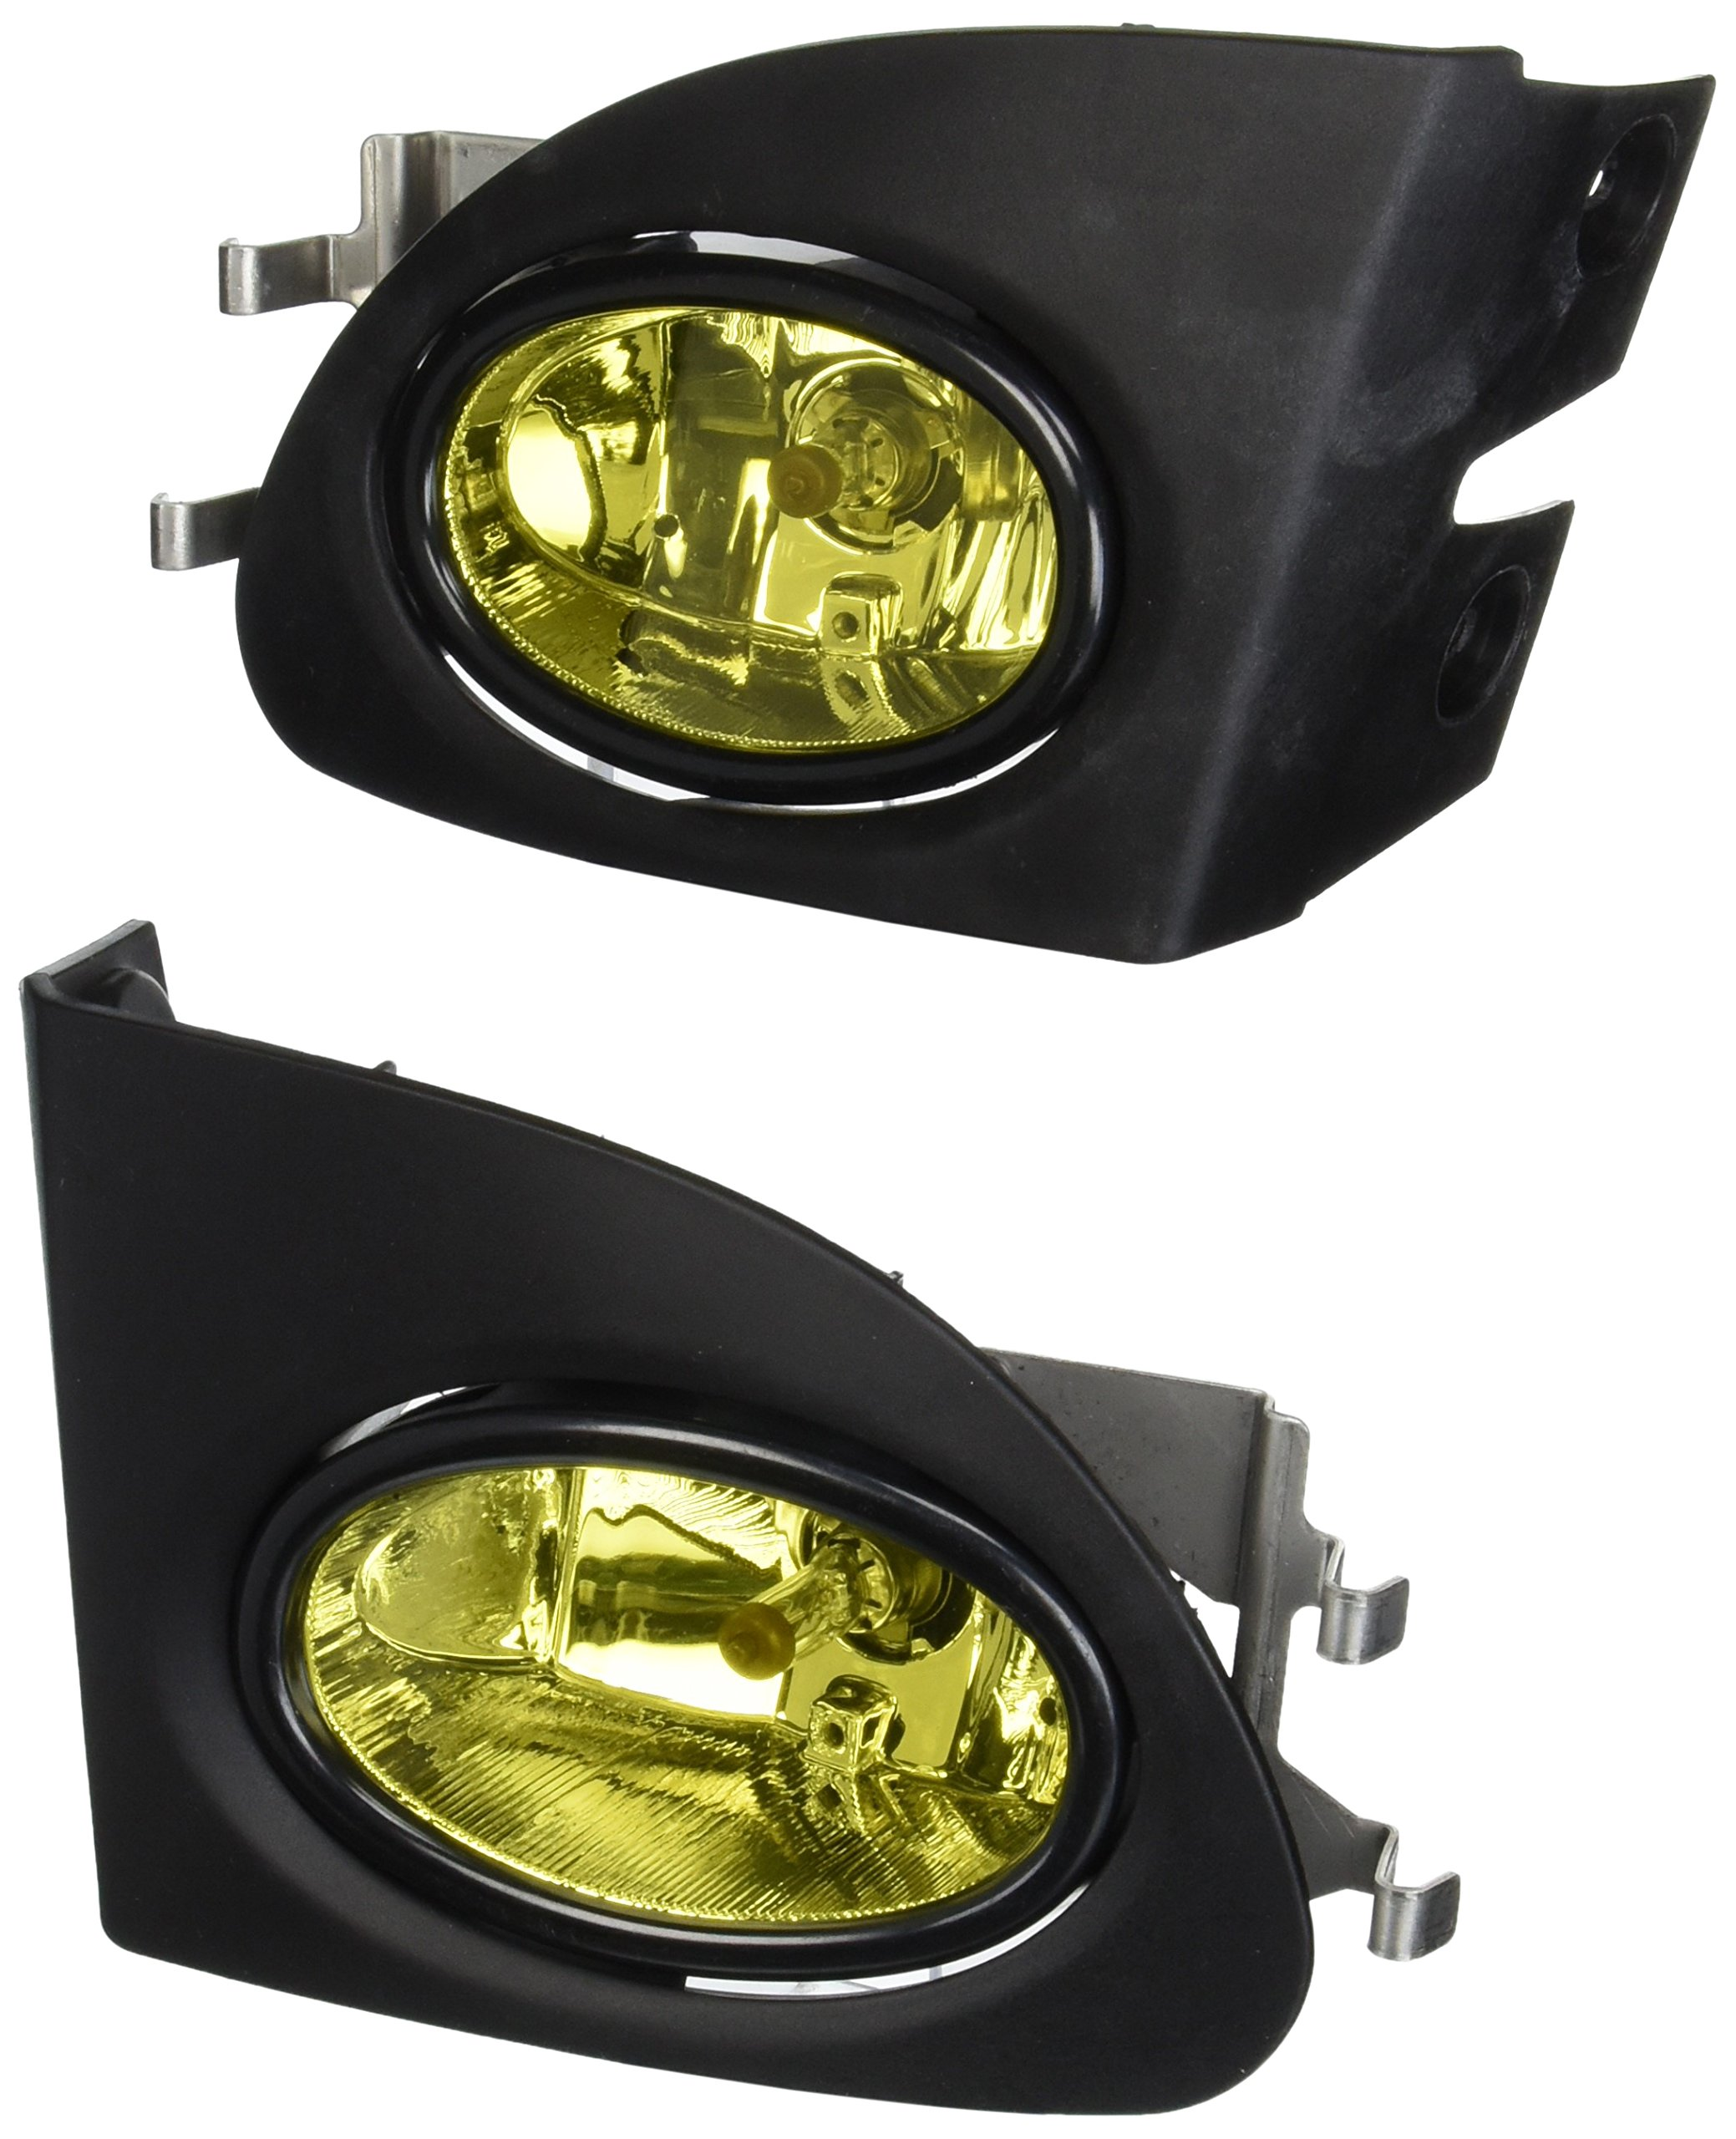 Amazon.com: Spec-D Tuning LF-CV023AMOEM-DL For Honda Civic Si Hatchback EP3  Yellow Bumper Diving Fog Lights Pair: Automotive